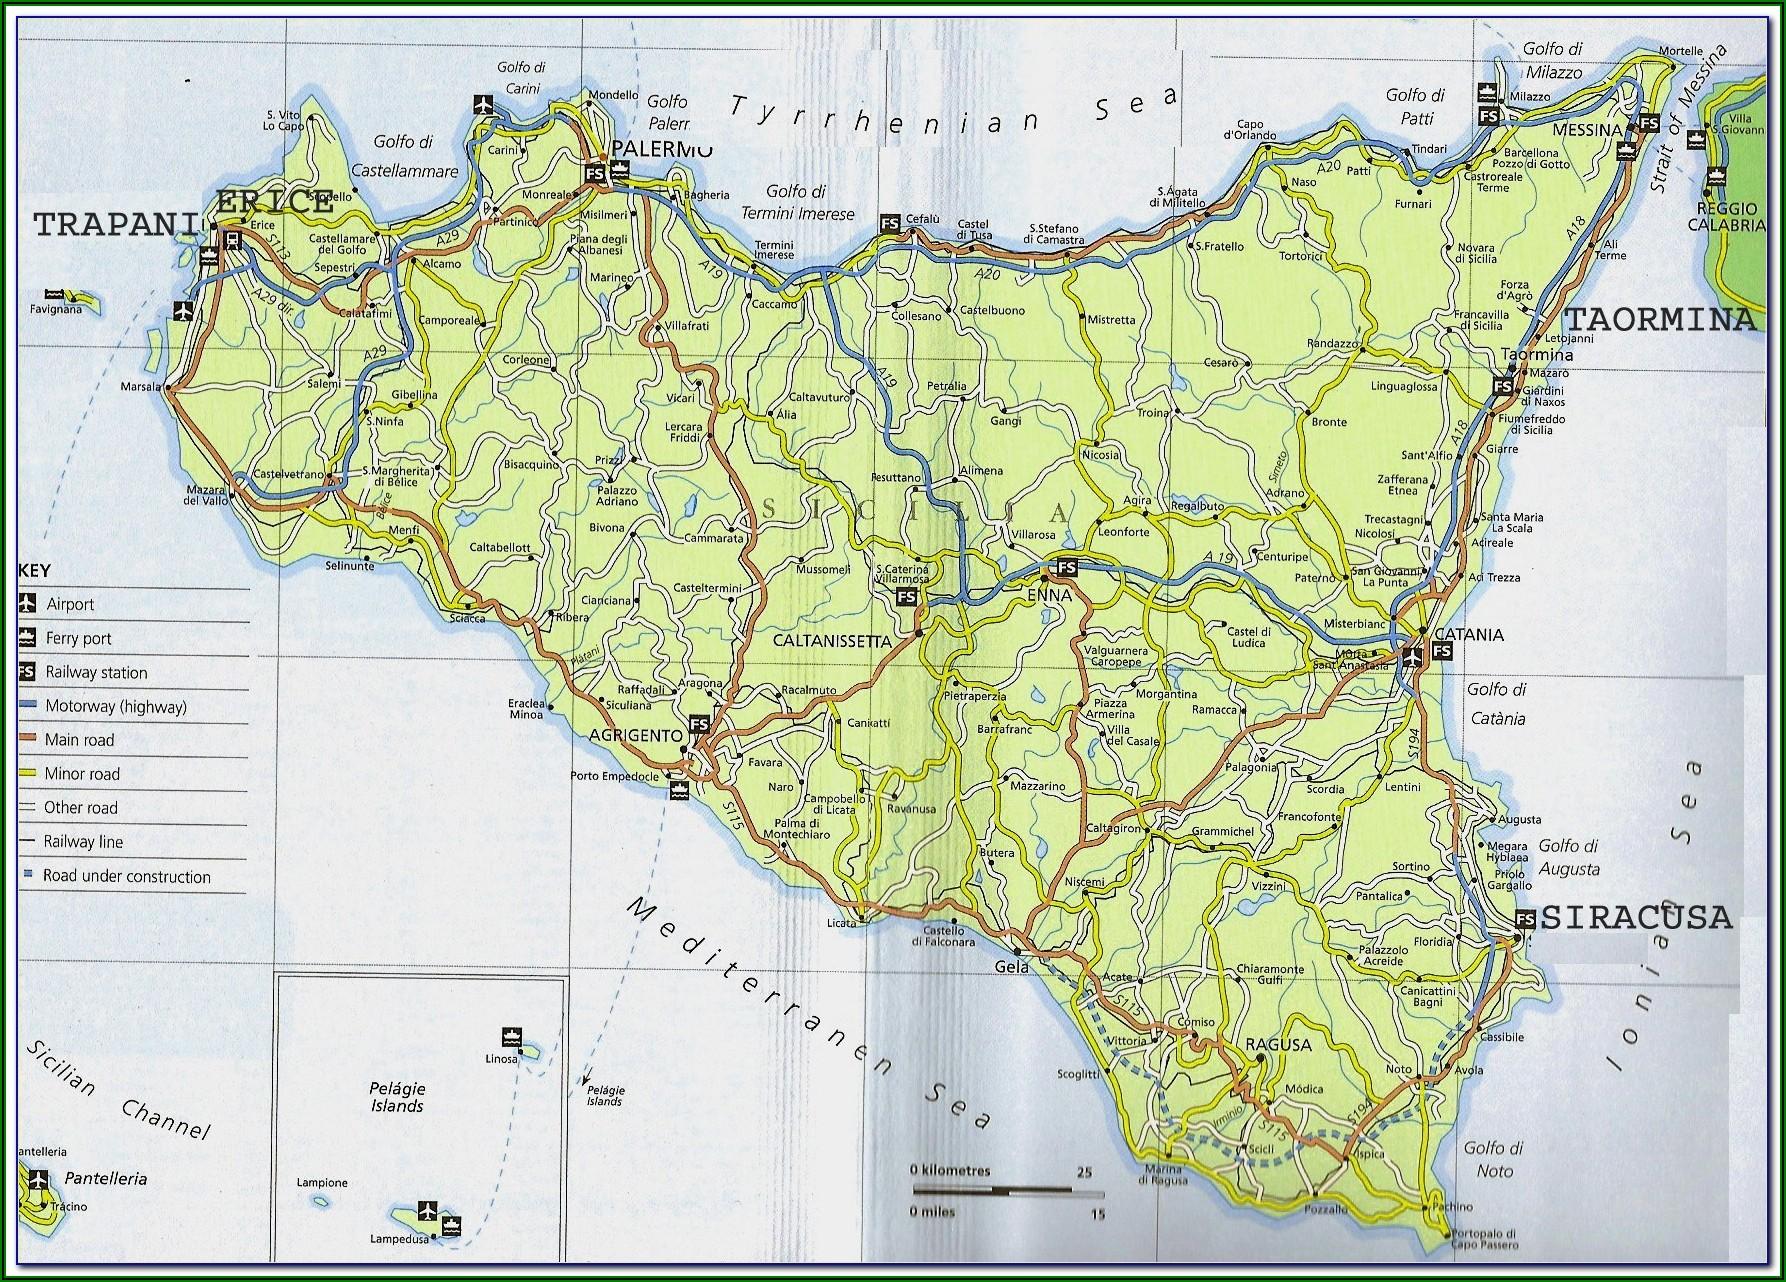 Noto Sicily Tourist Map